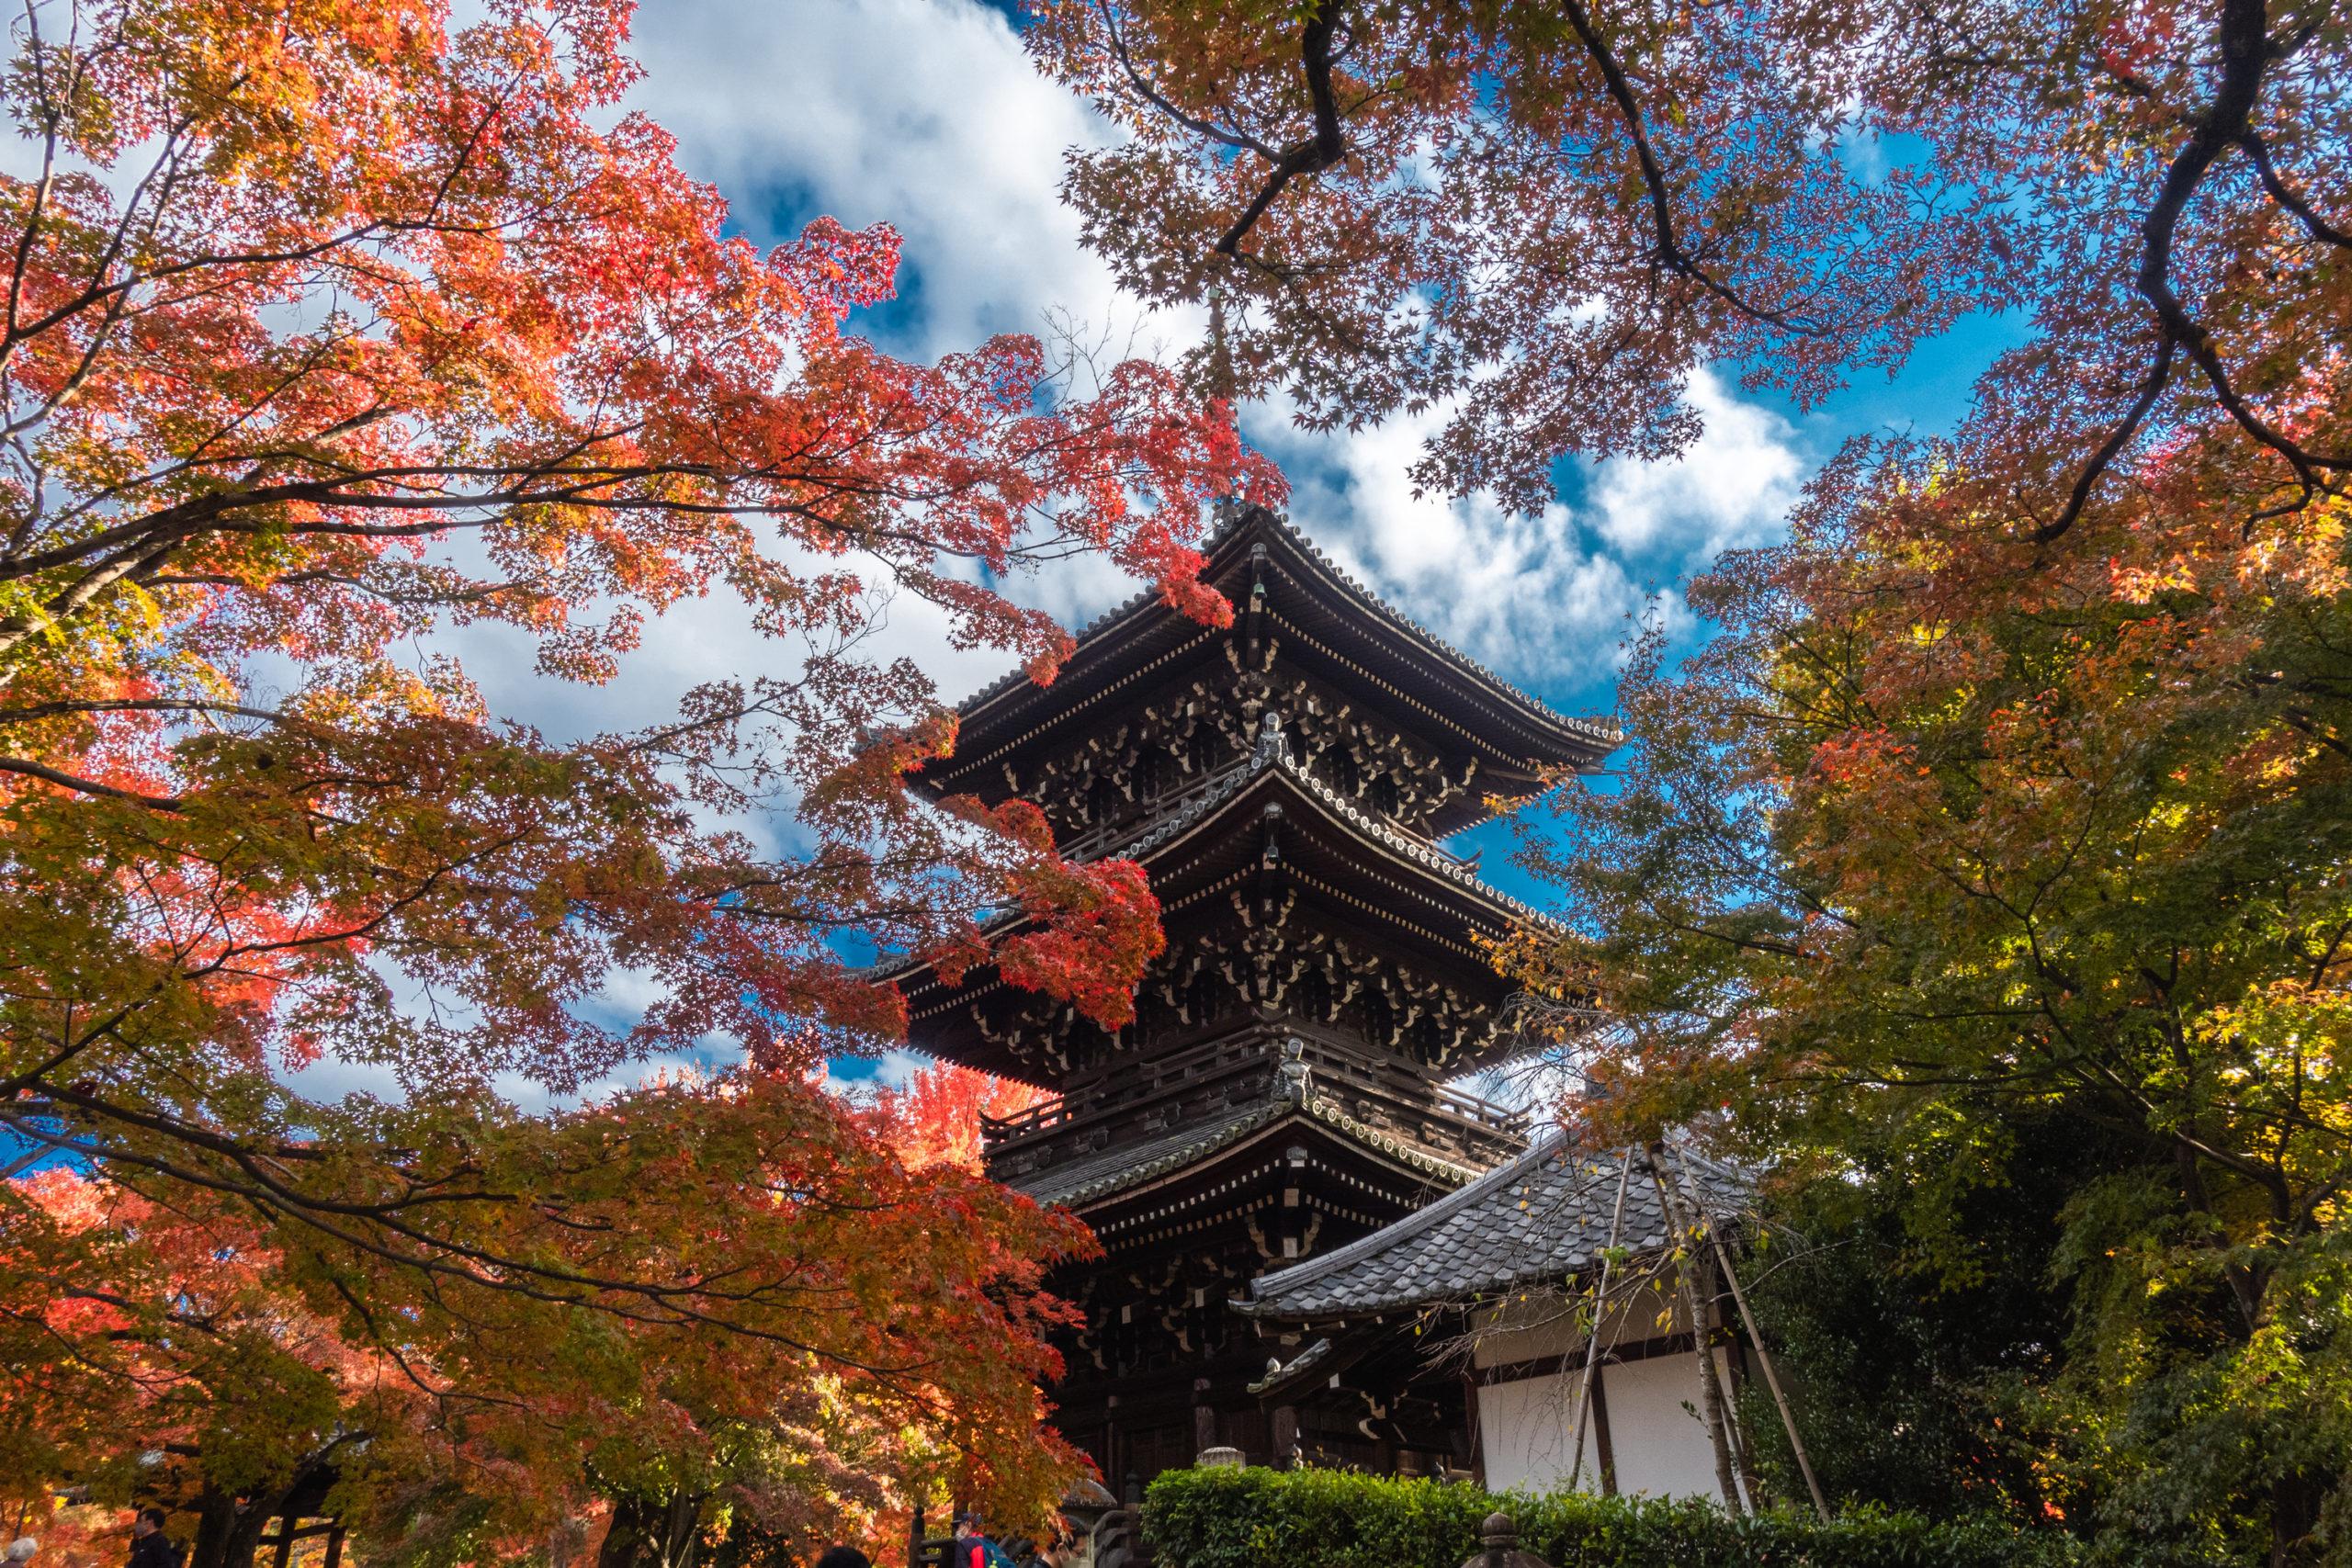 DSC00805-scaled 京都  真如堂(三重塔と紅葉の風情を感じる景色が美しい秋におすすめのスポット!撮影した写真の紹介、アクセス情報など)